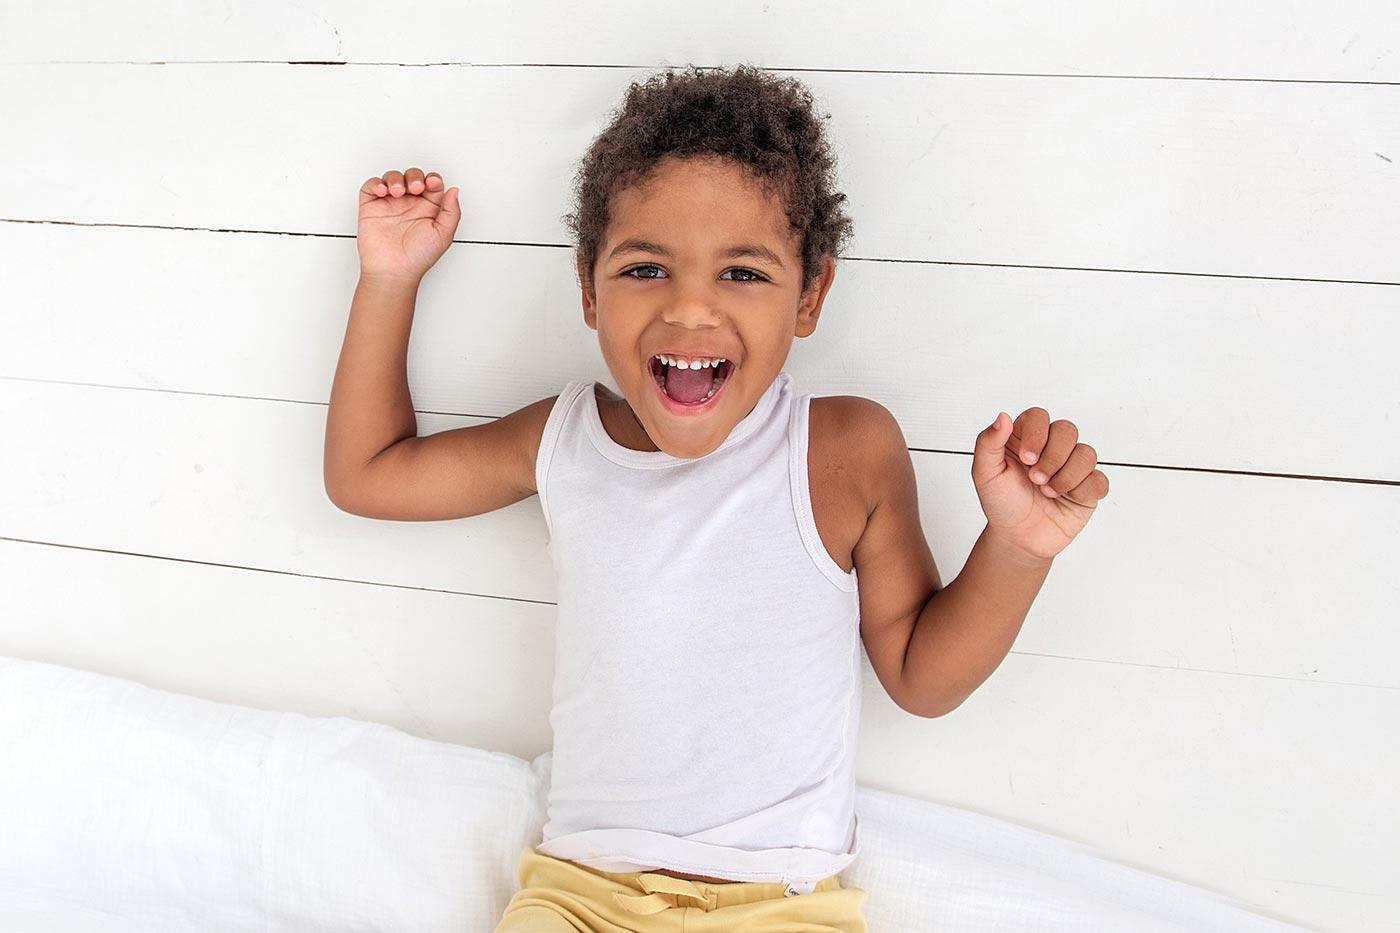 The Importance of Teaching Children Boundaries